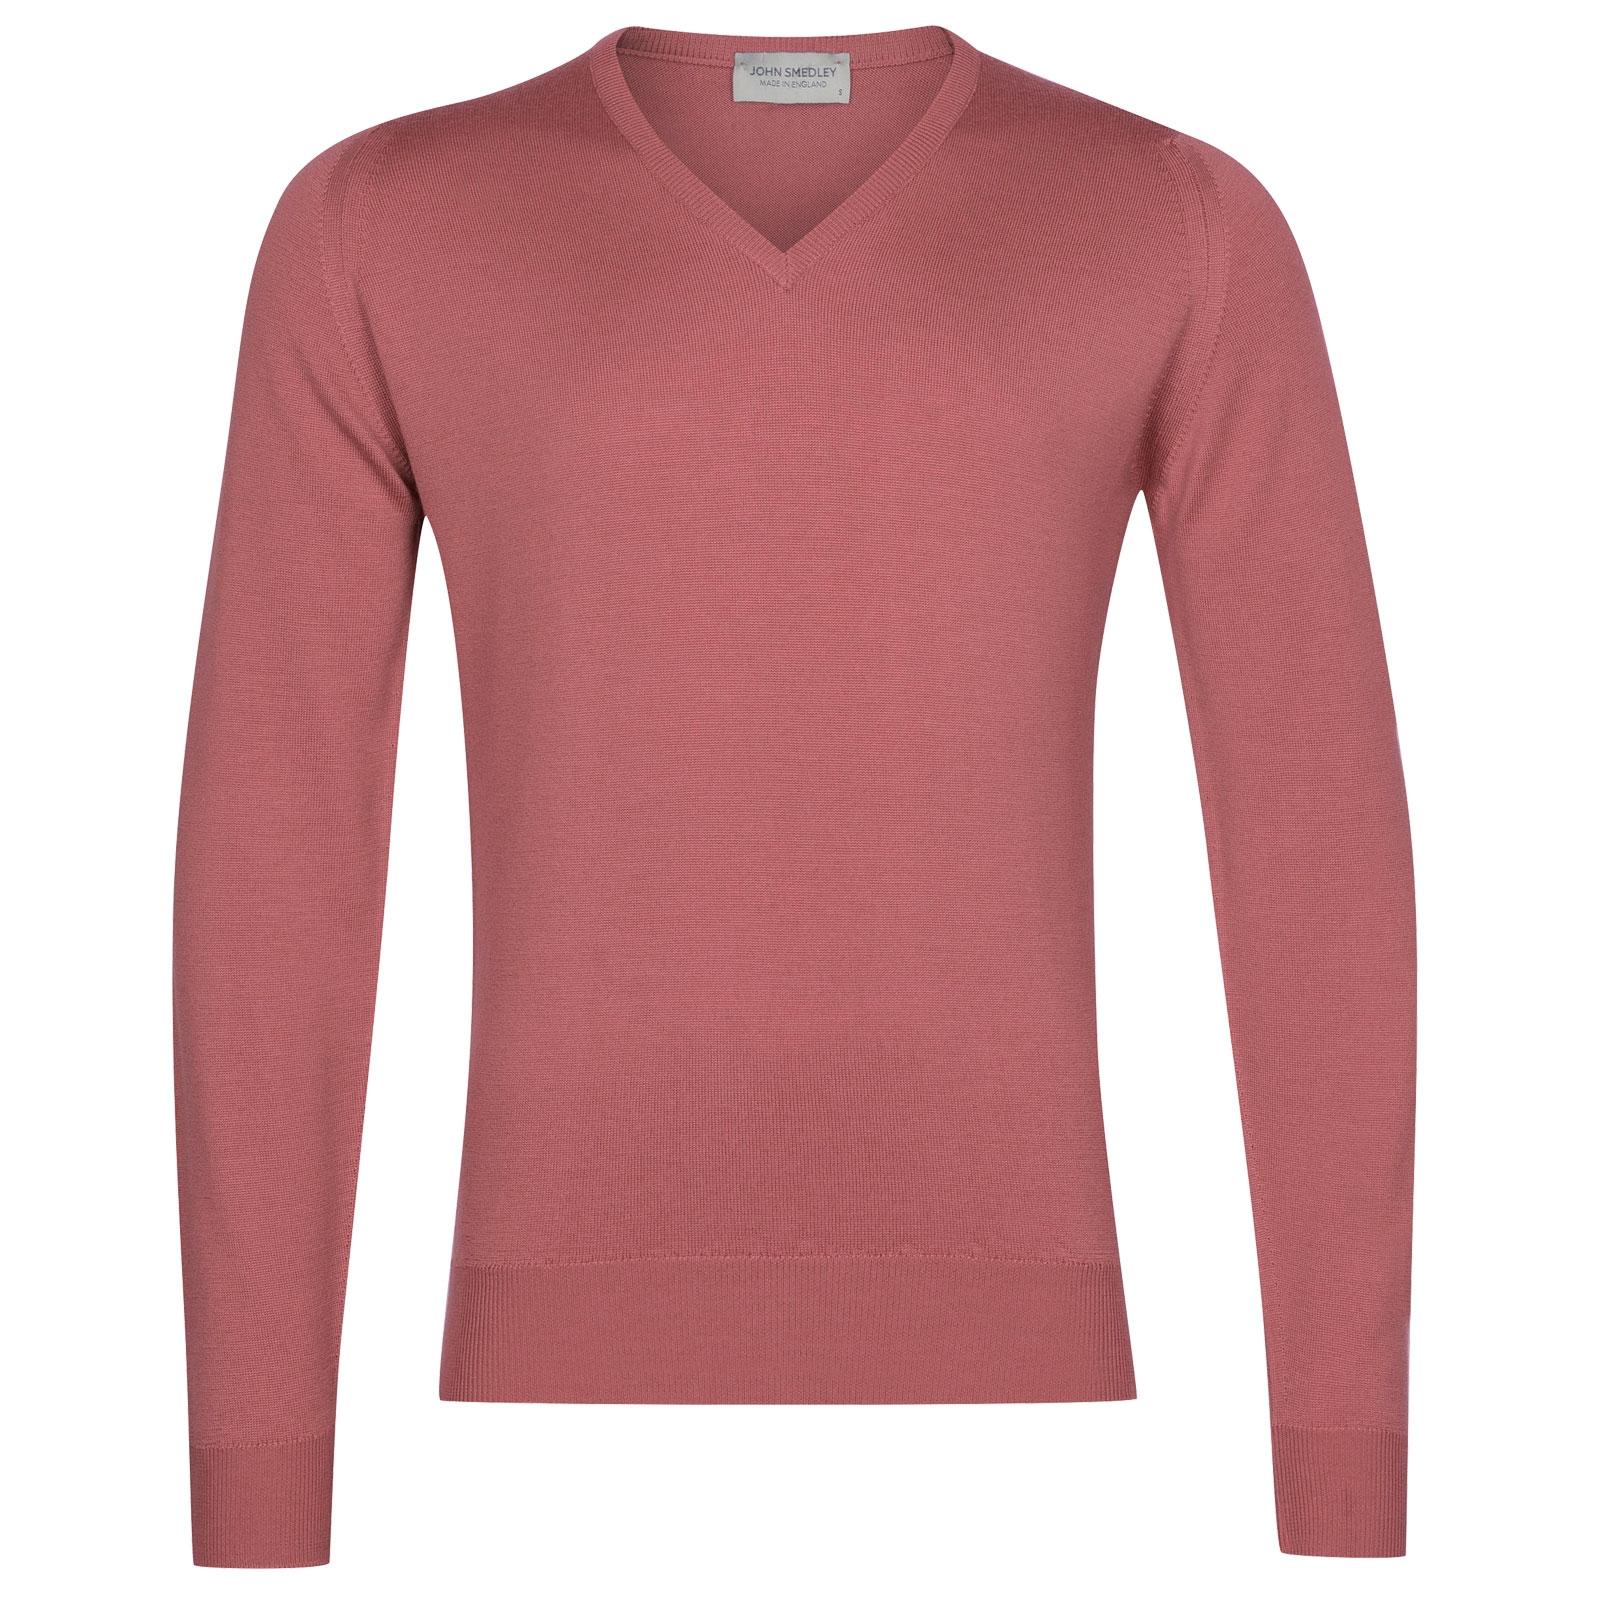 John Smedley Blenheim in Azalea Pink Pullover-SML